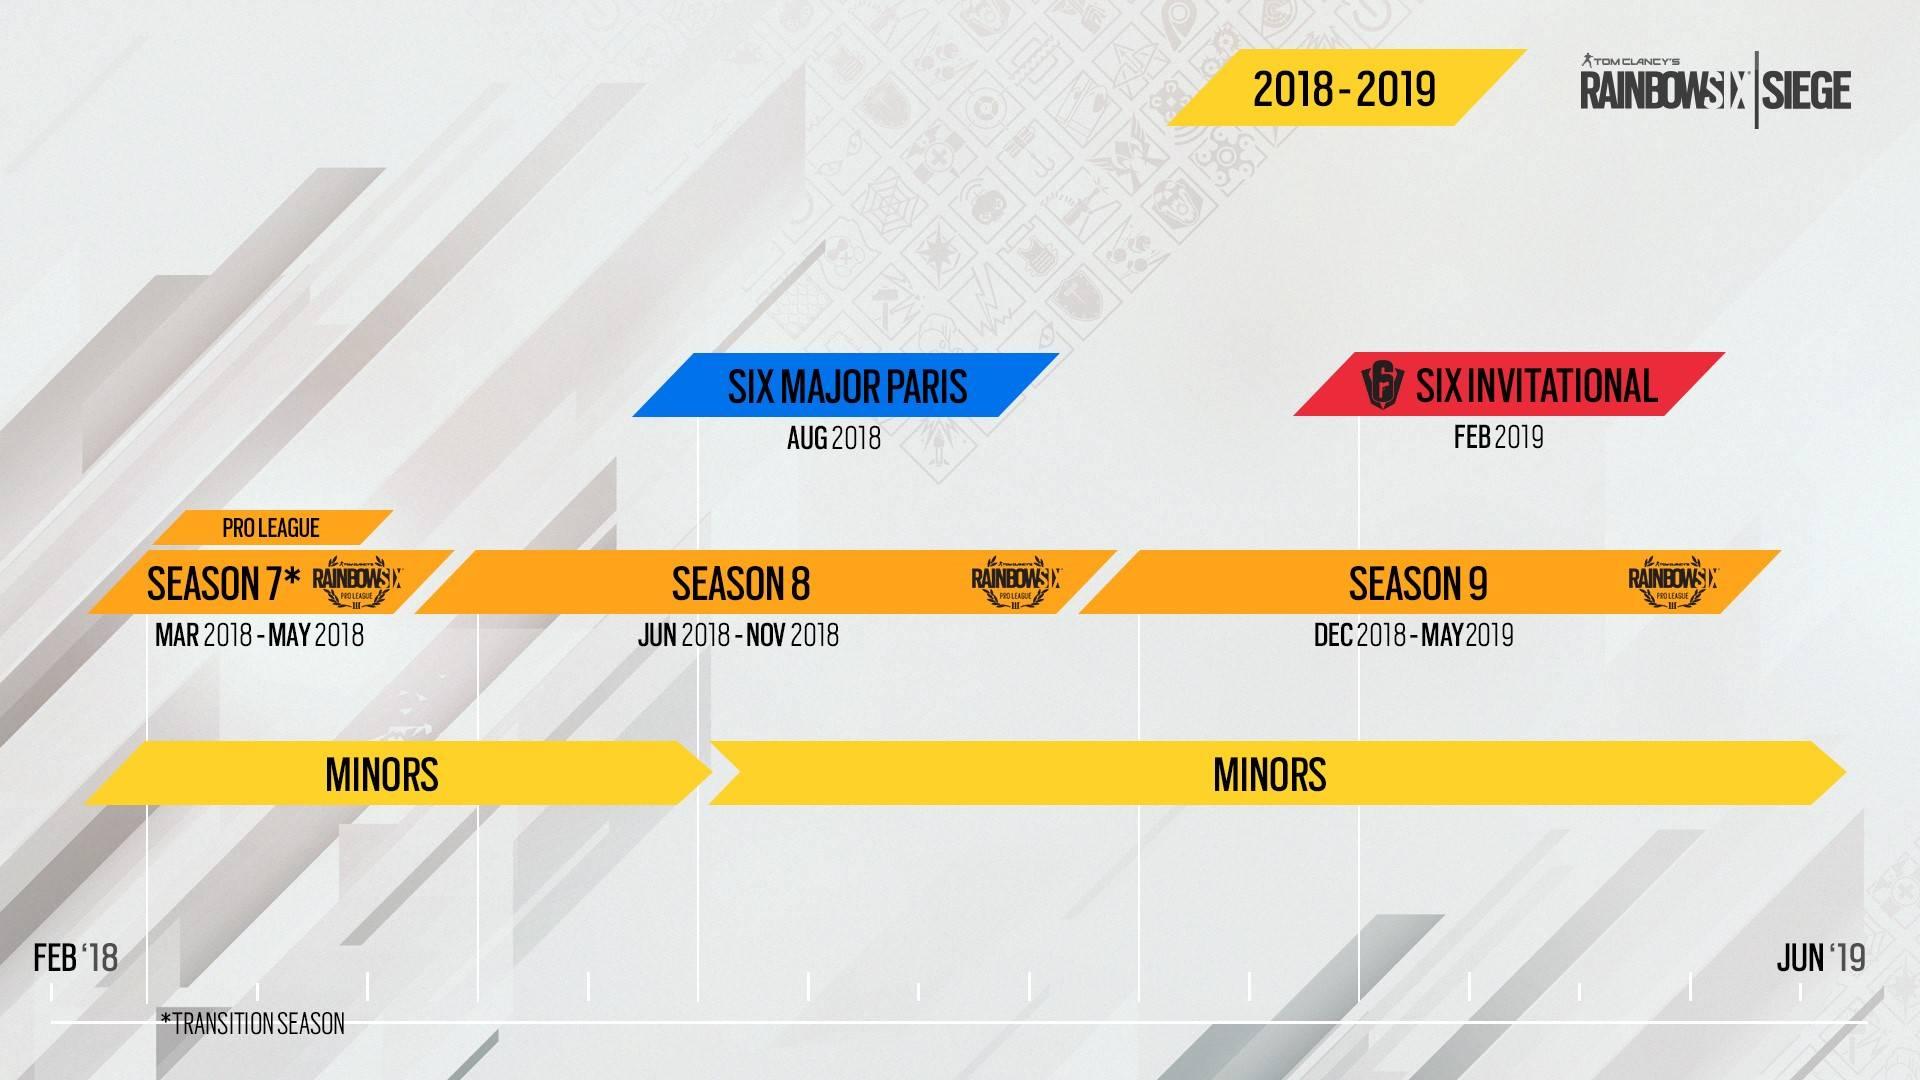 Rainbow Six: Siege Pro League